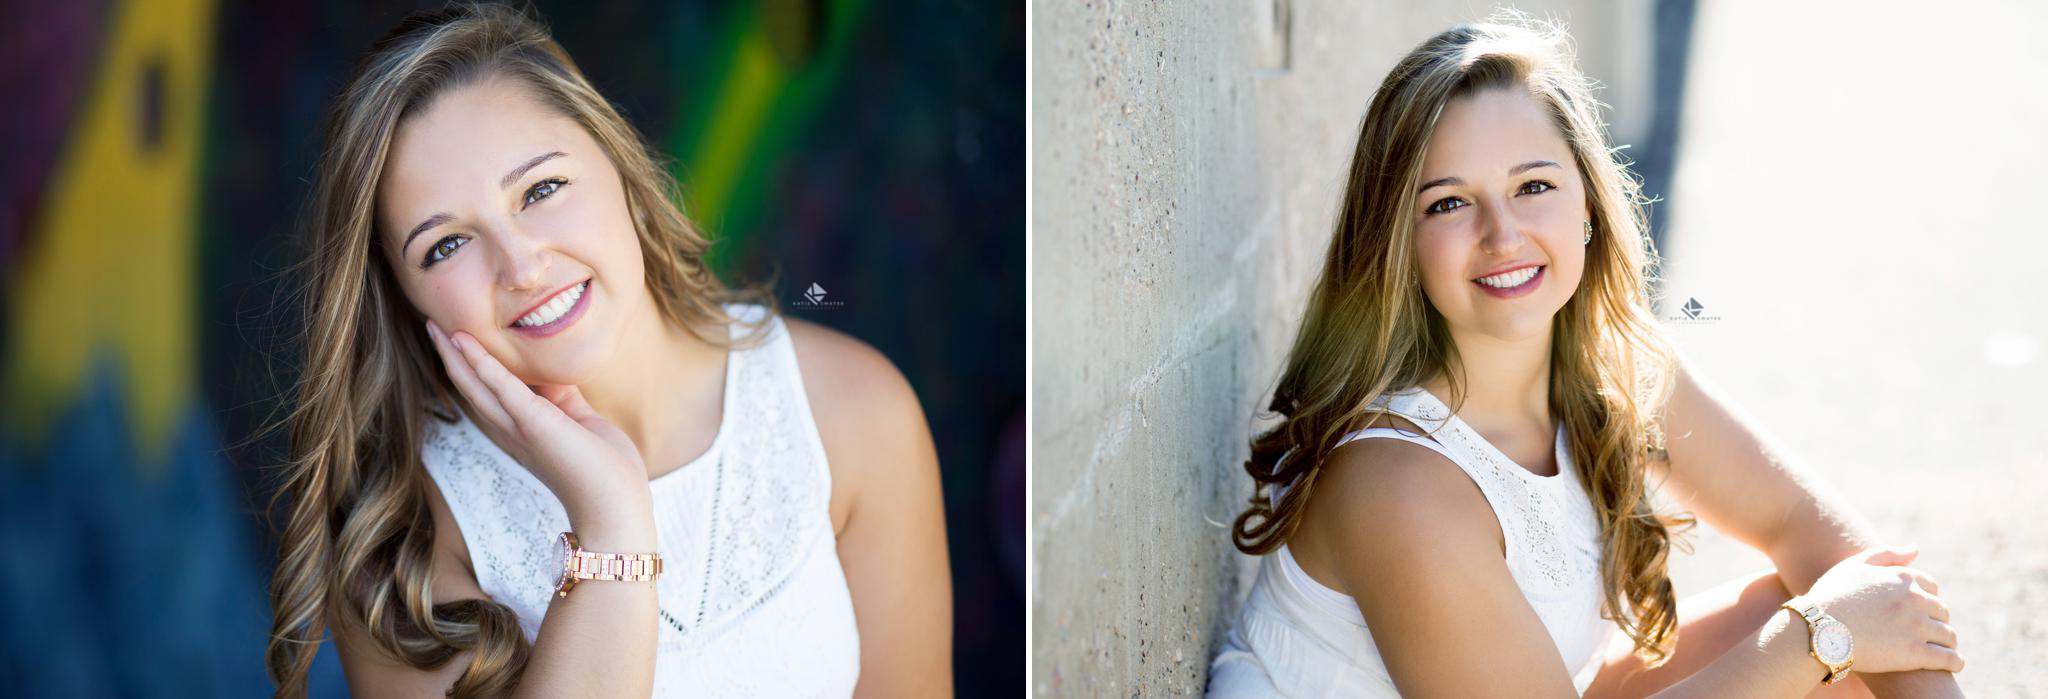 brunette senior girl in a white top in front of brick walls in deadwood south dakota